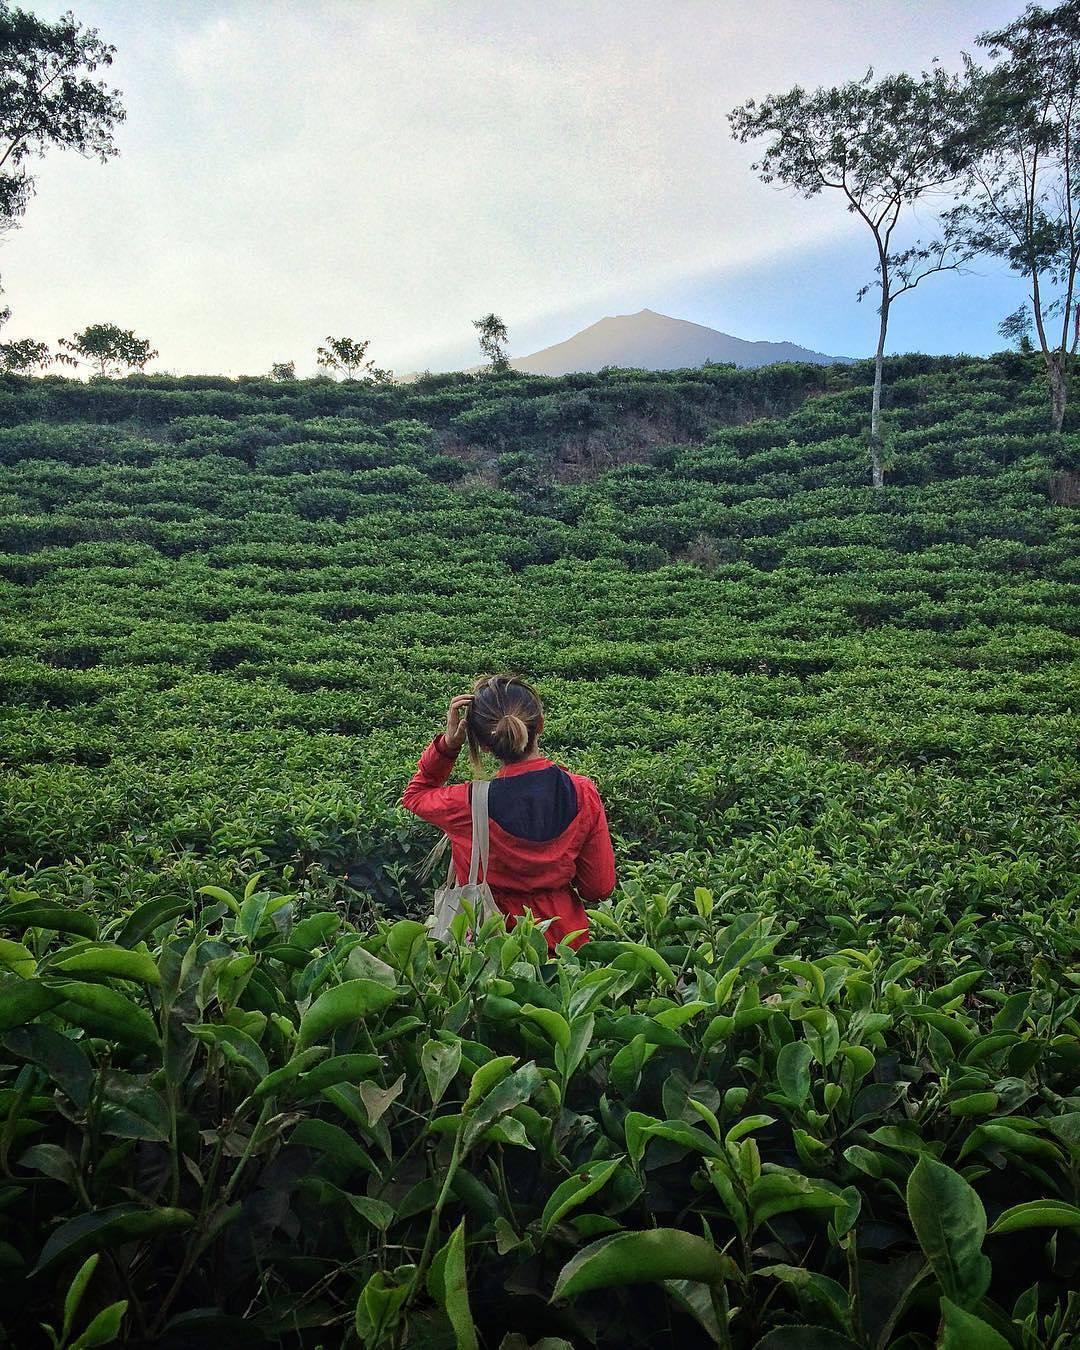 Menemukan 10 Keistimewaan Kebun Teh Bukit Kuneer Wonosari Malang Kesejukan